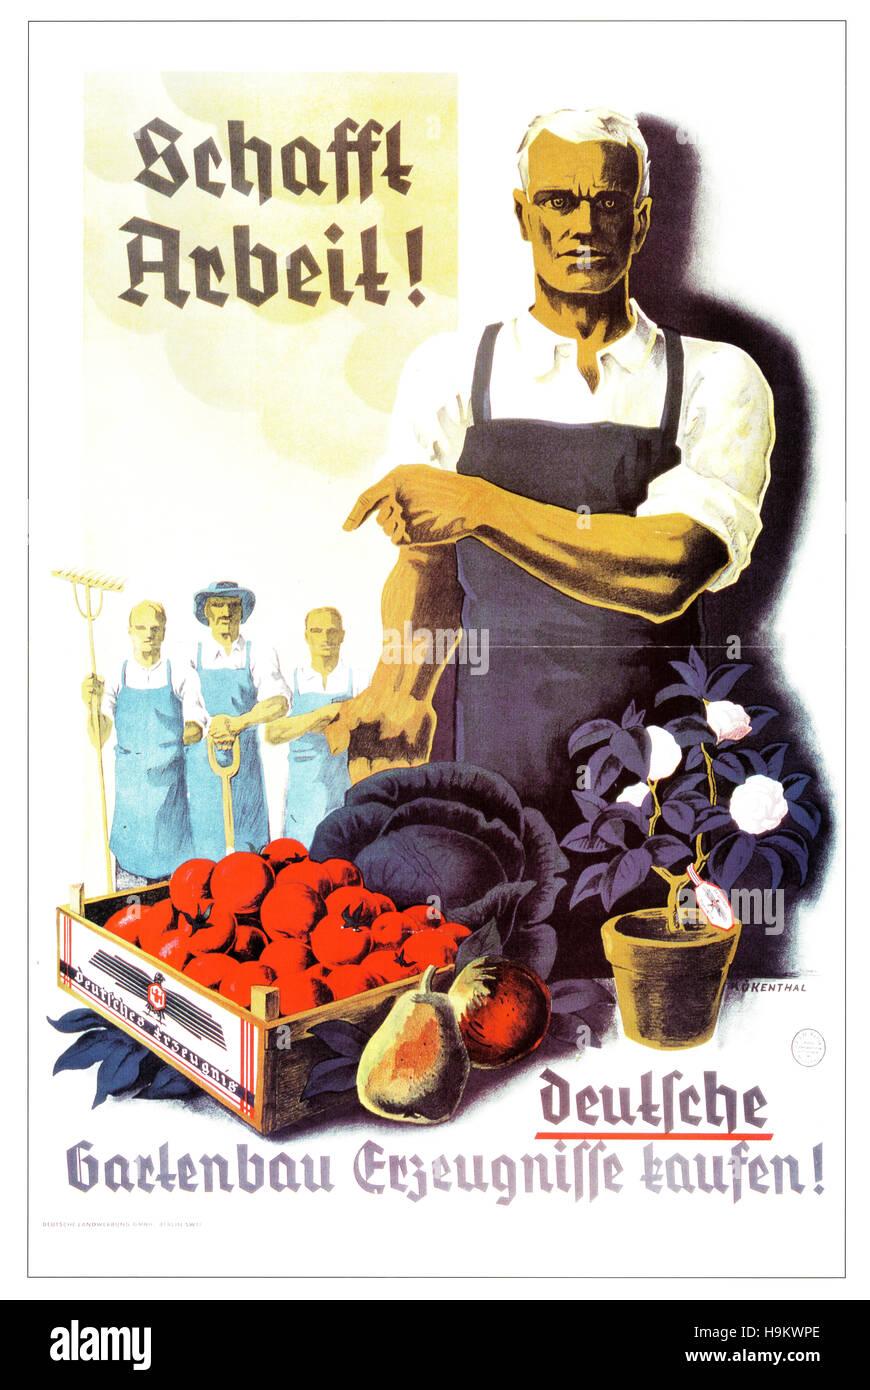 1933 Nazi Propaganda Self-sufficiency poster - Stock Image